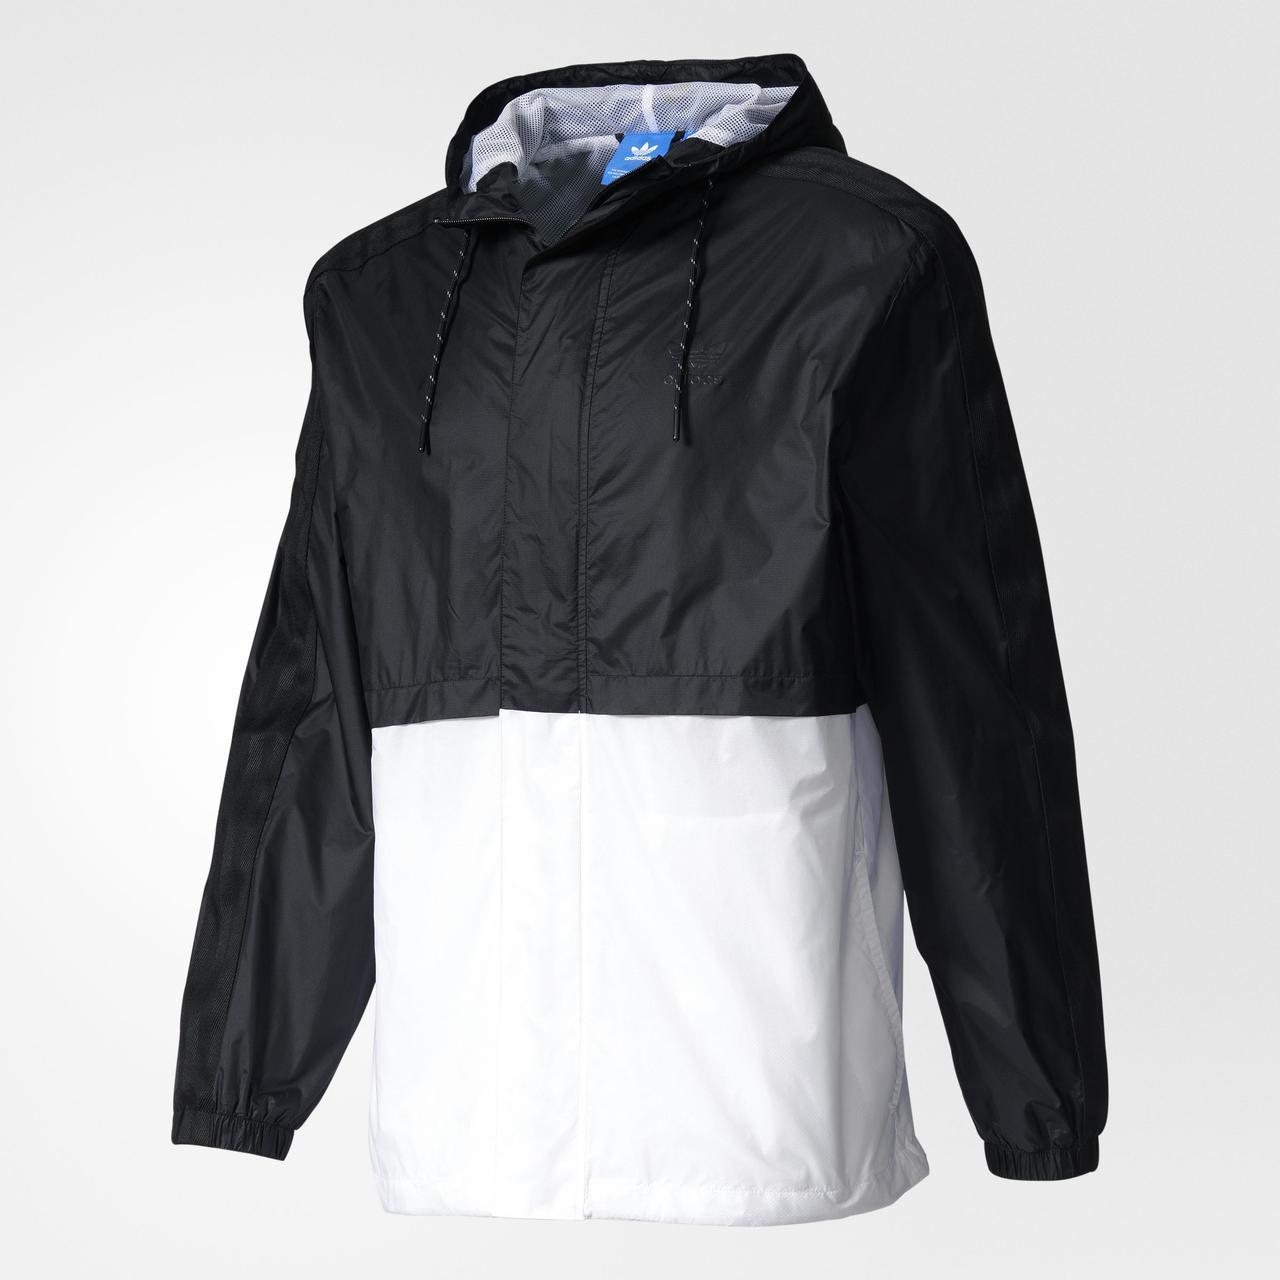 9b59f536 Мужская зимняя куртка adidas BERLIN WB BK0029 - AdiSport в Харькове